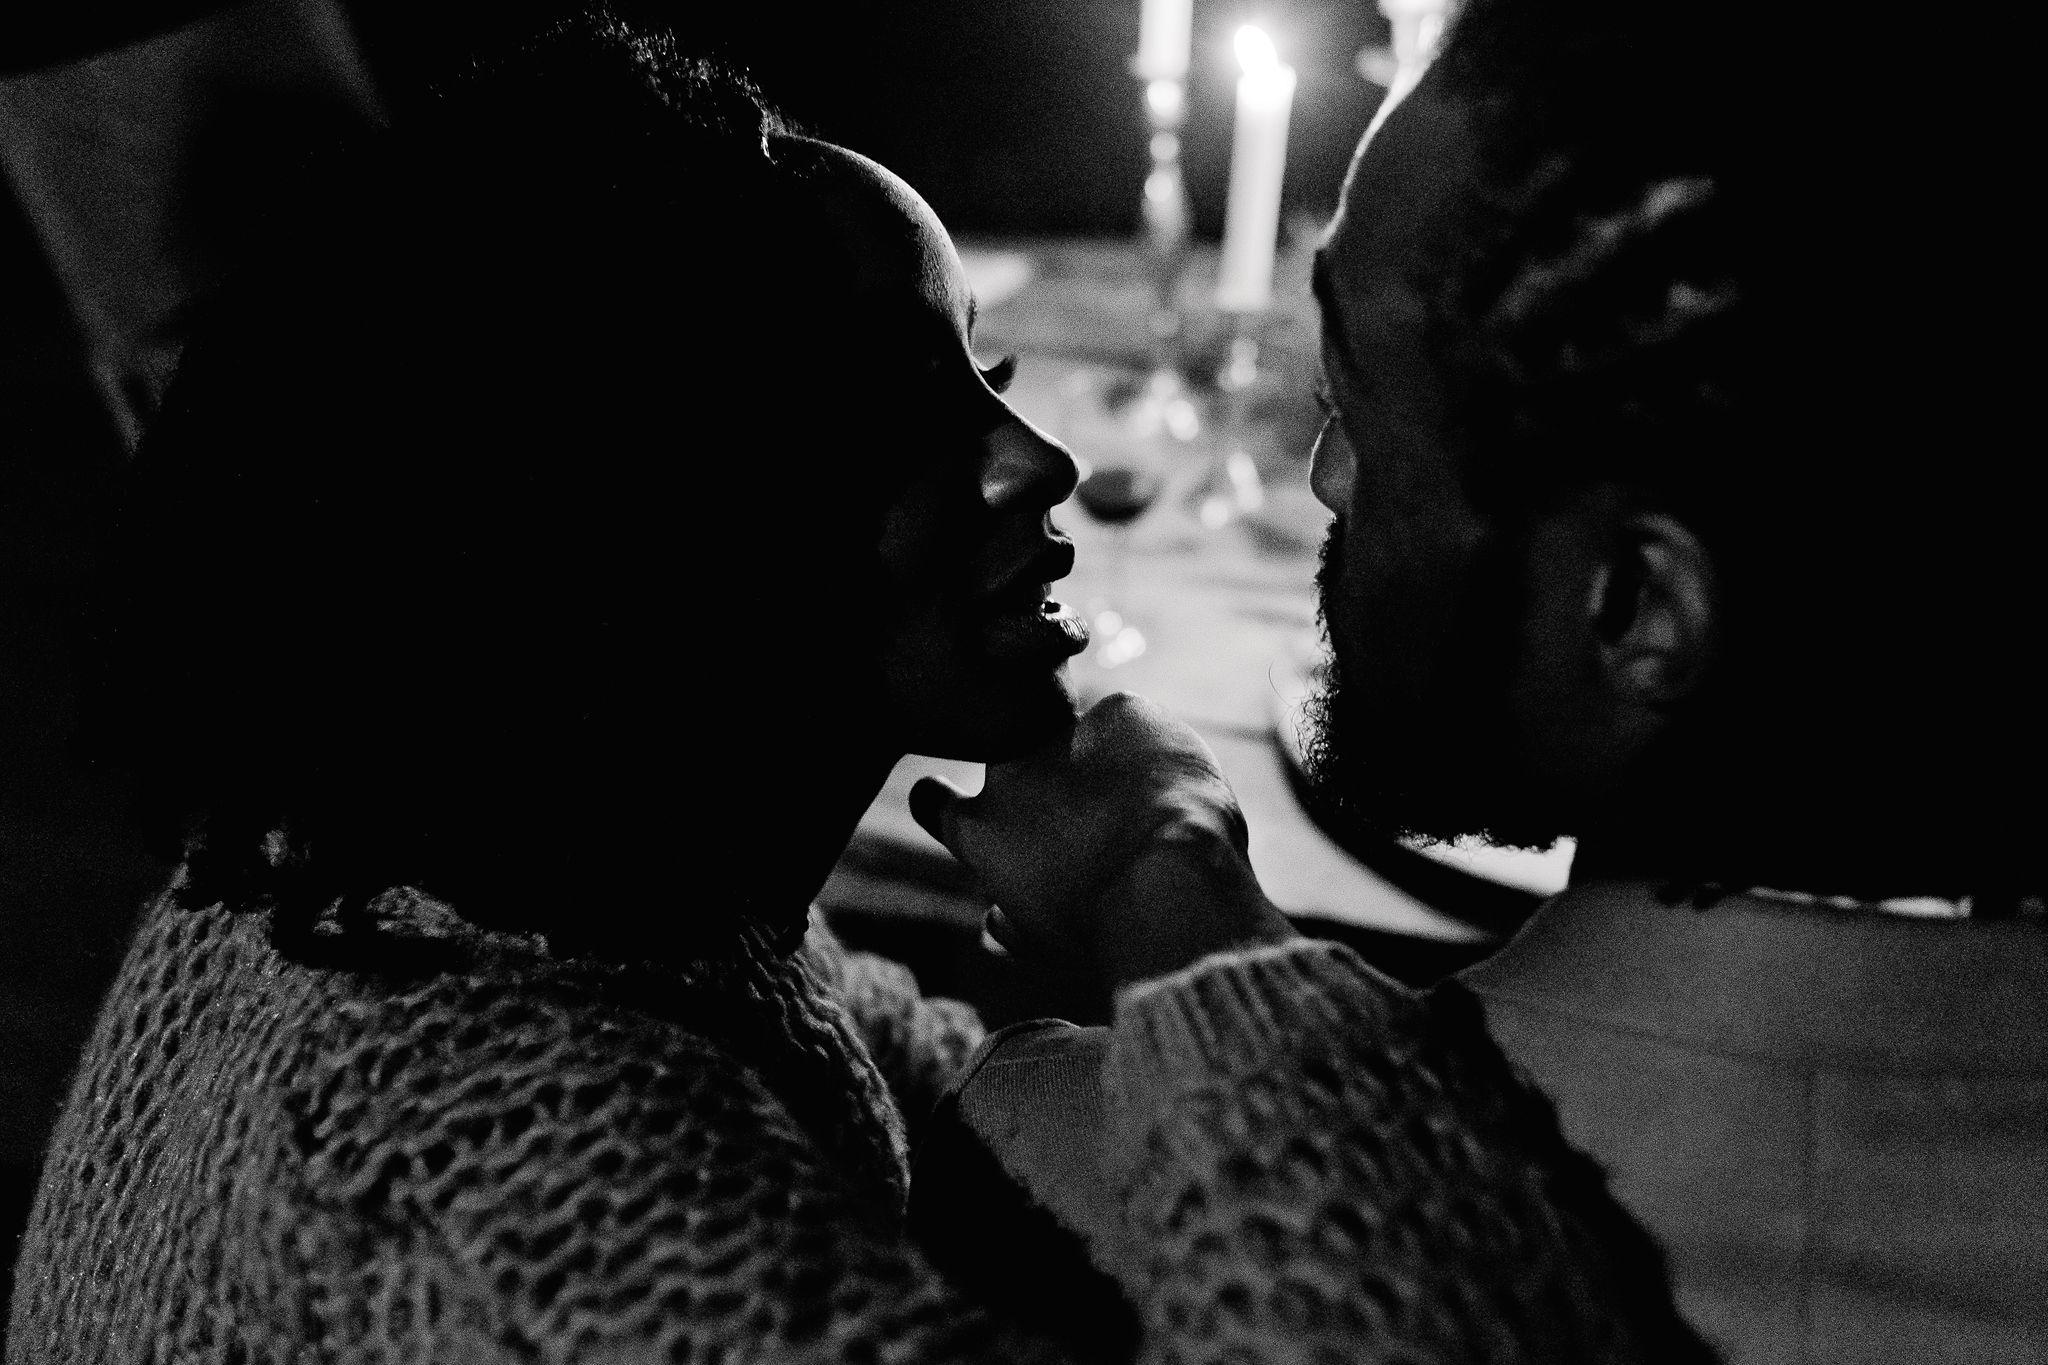 Anna-Hari-Photography-Destination-Wedding-Photographer-Kenya-309.jpg